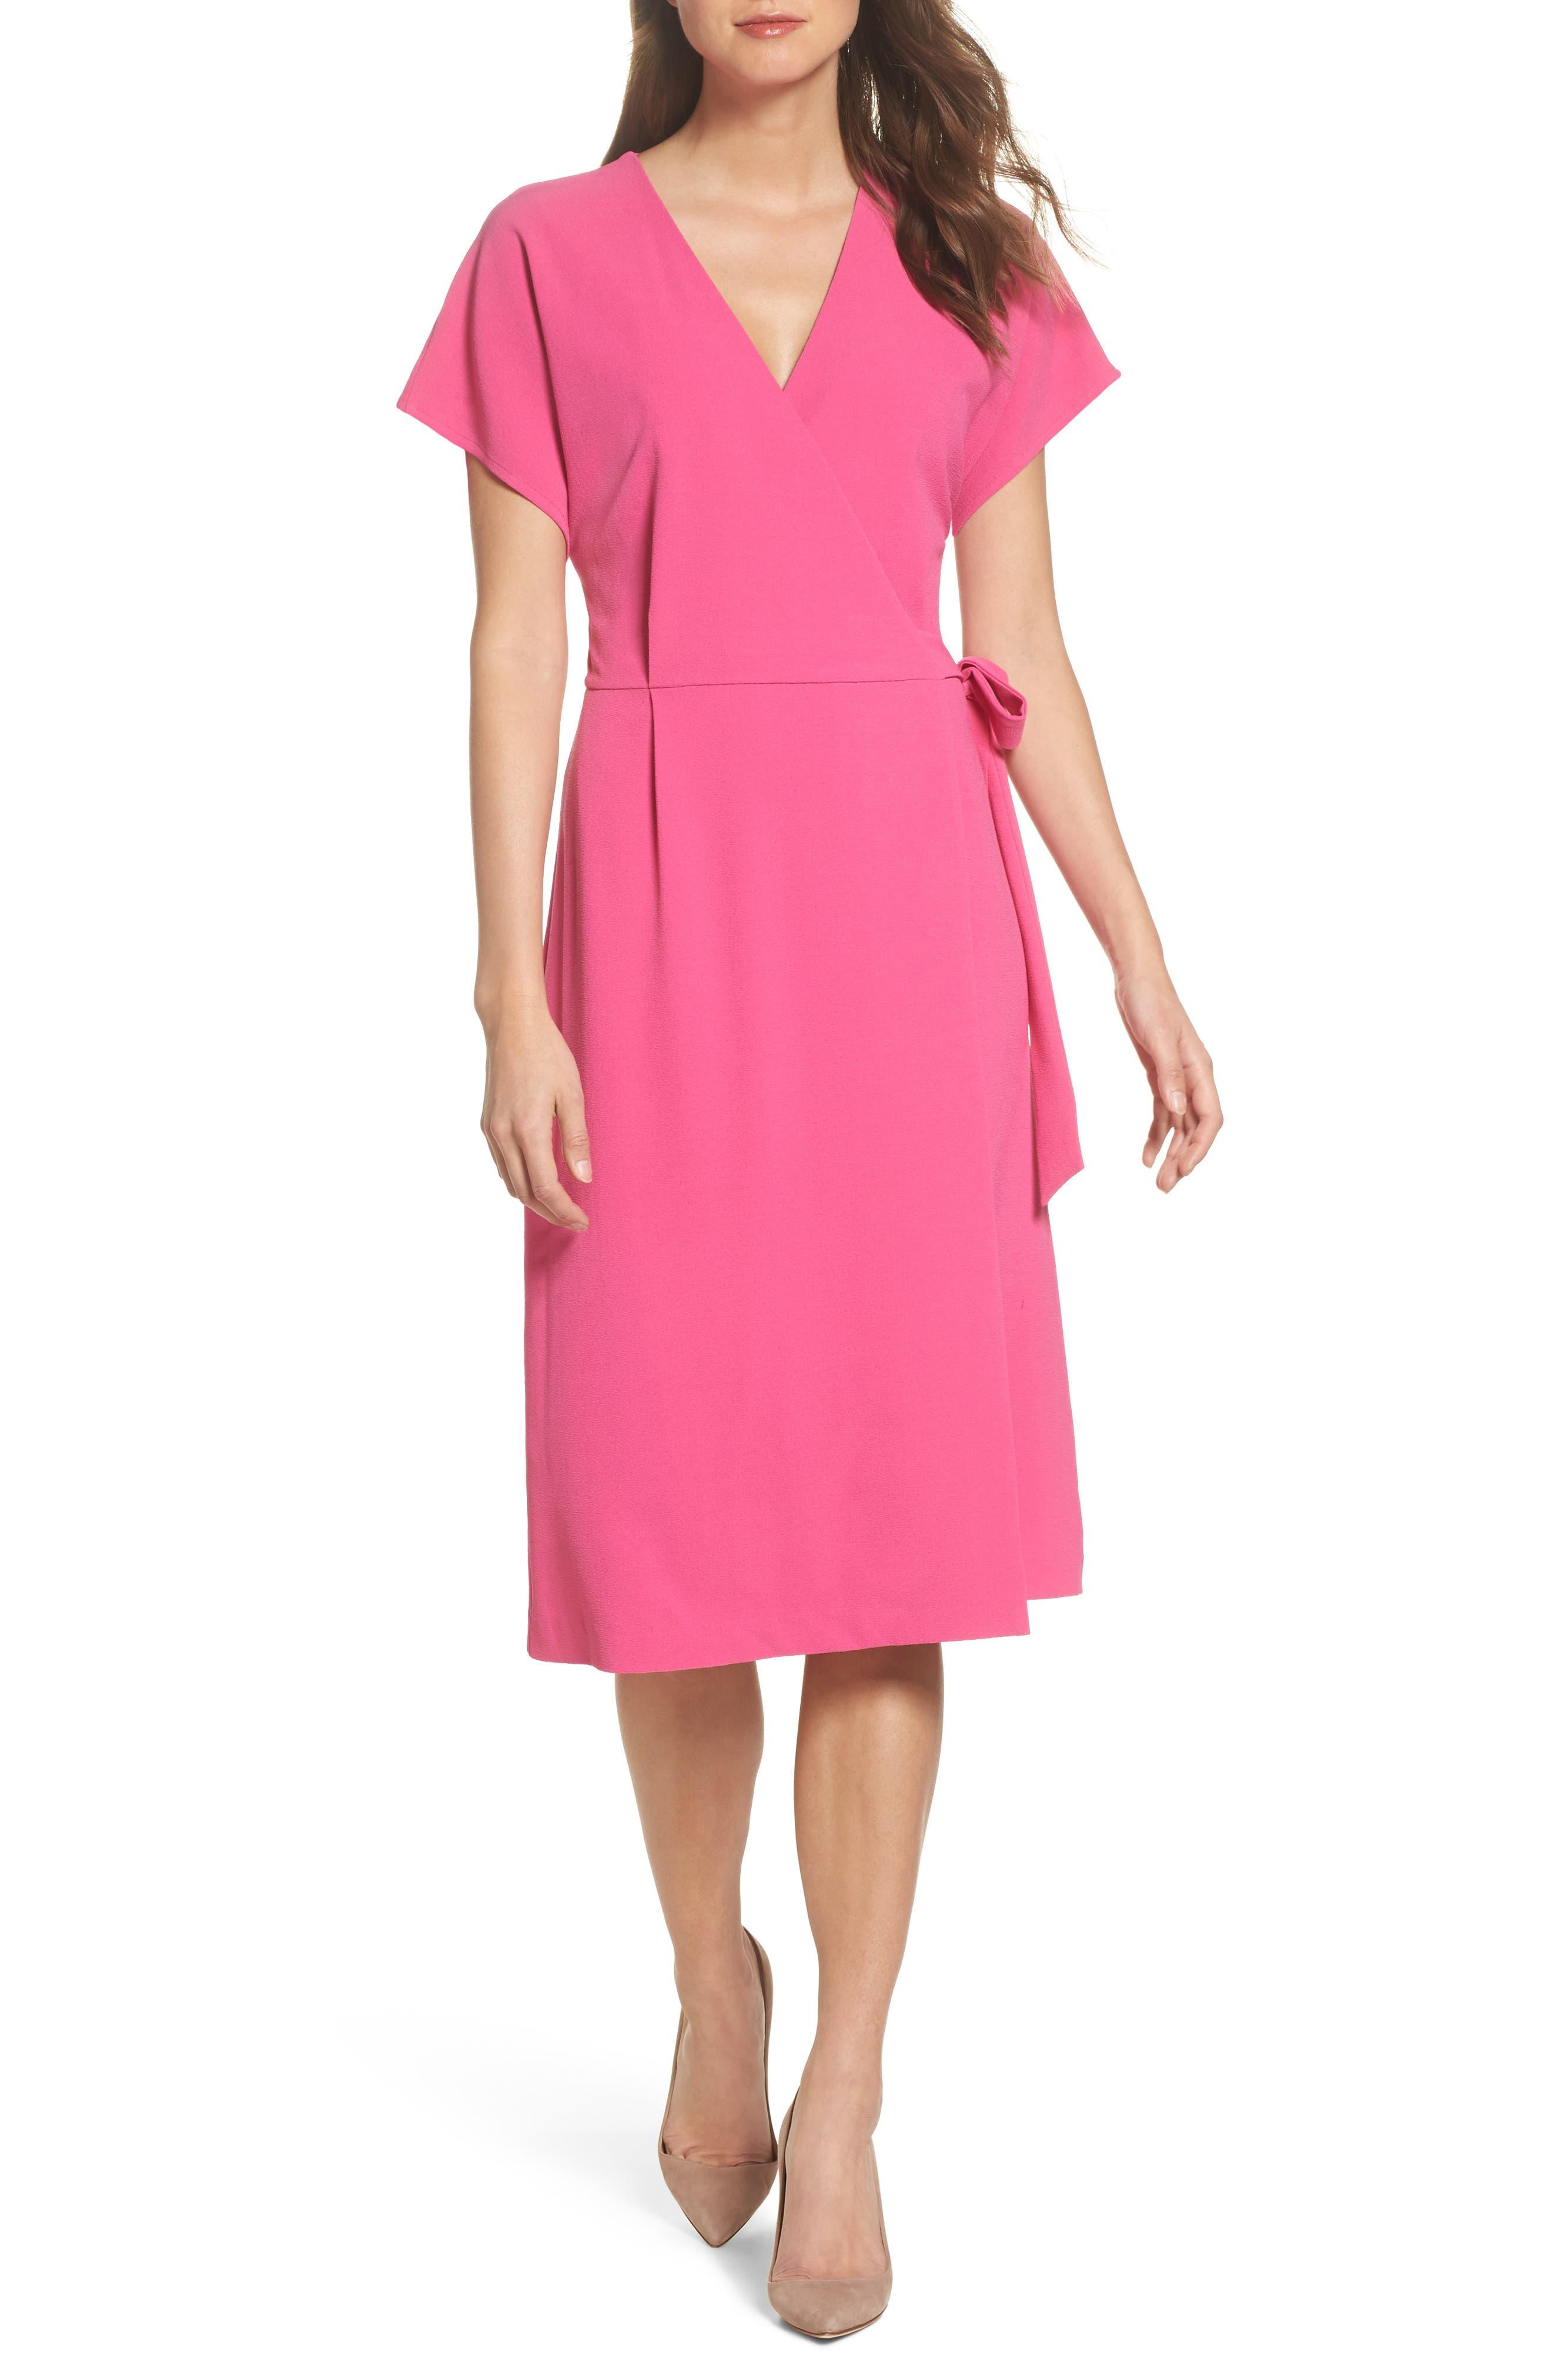 Alternate Image 1 Selected - Felicity & Coco Rita Wrap Dress (Regular & Petite) (Nordstrom Exclusive)